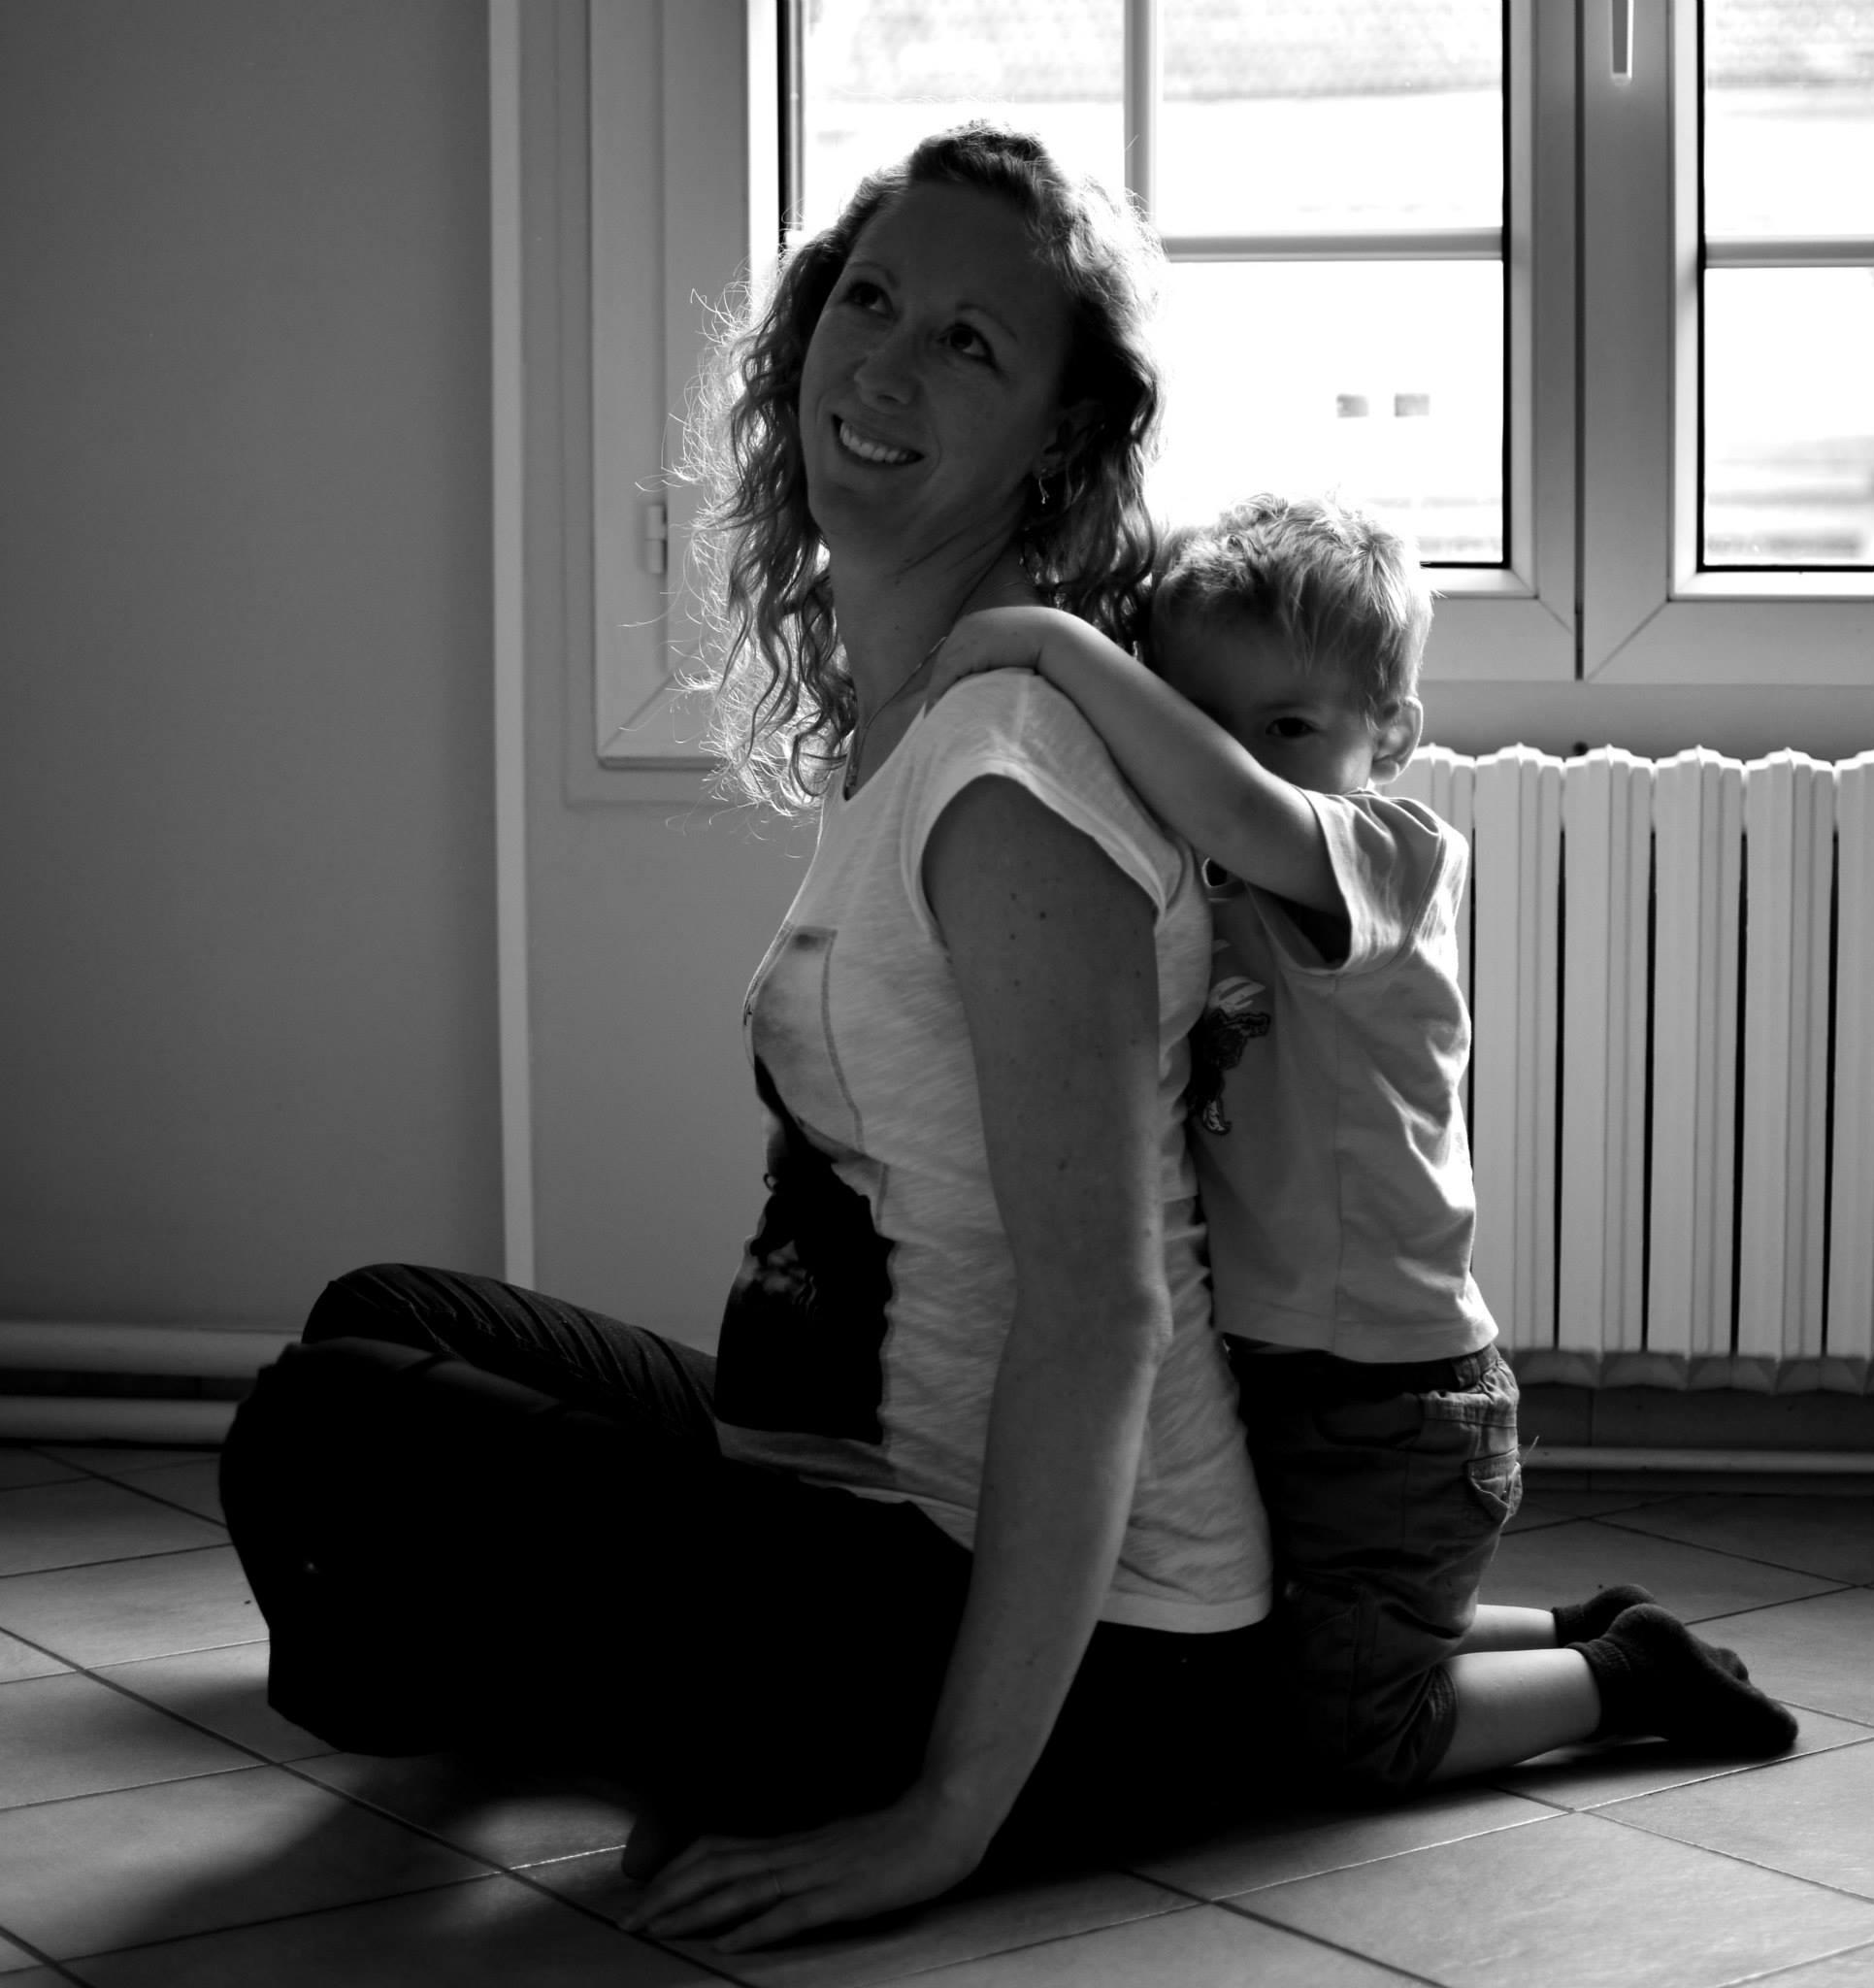 maman-8-caro-accouche-a-maison-enceinte